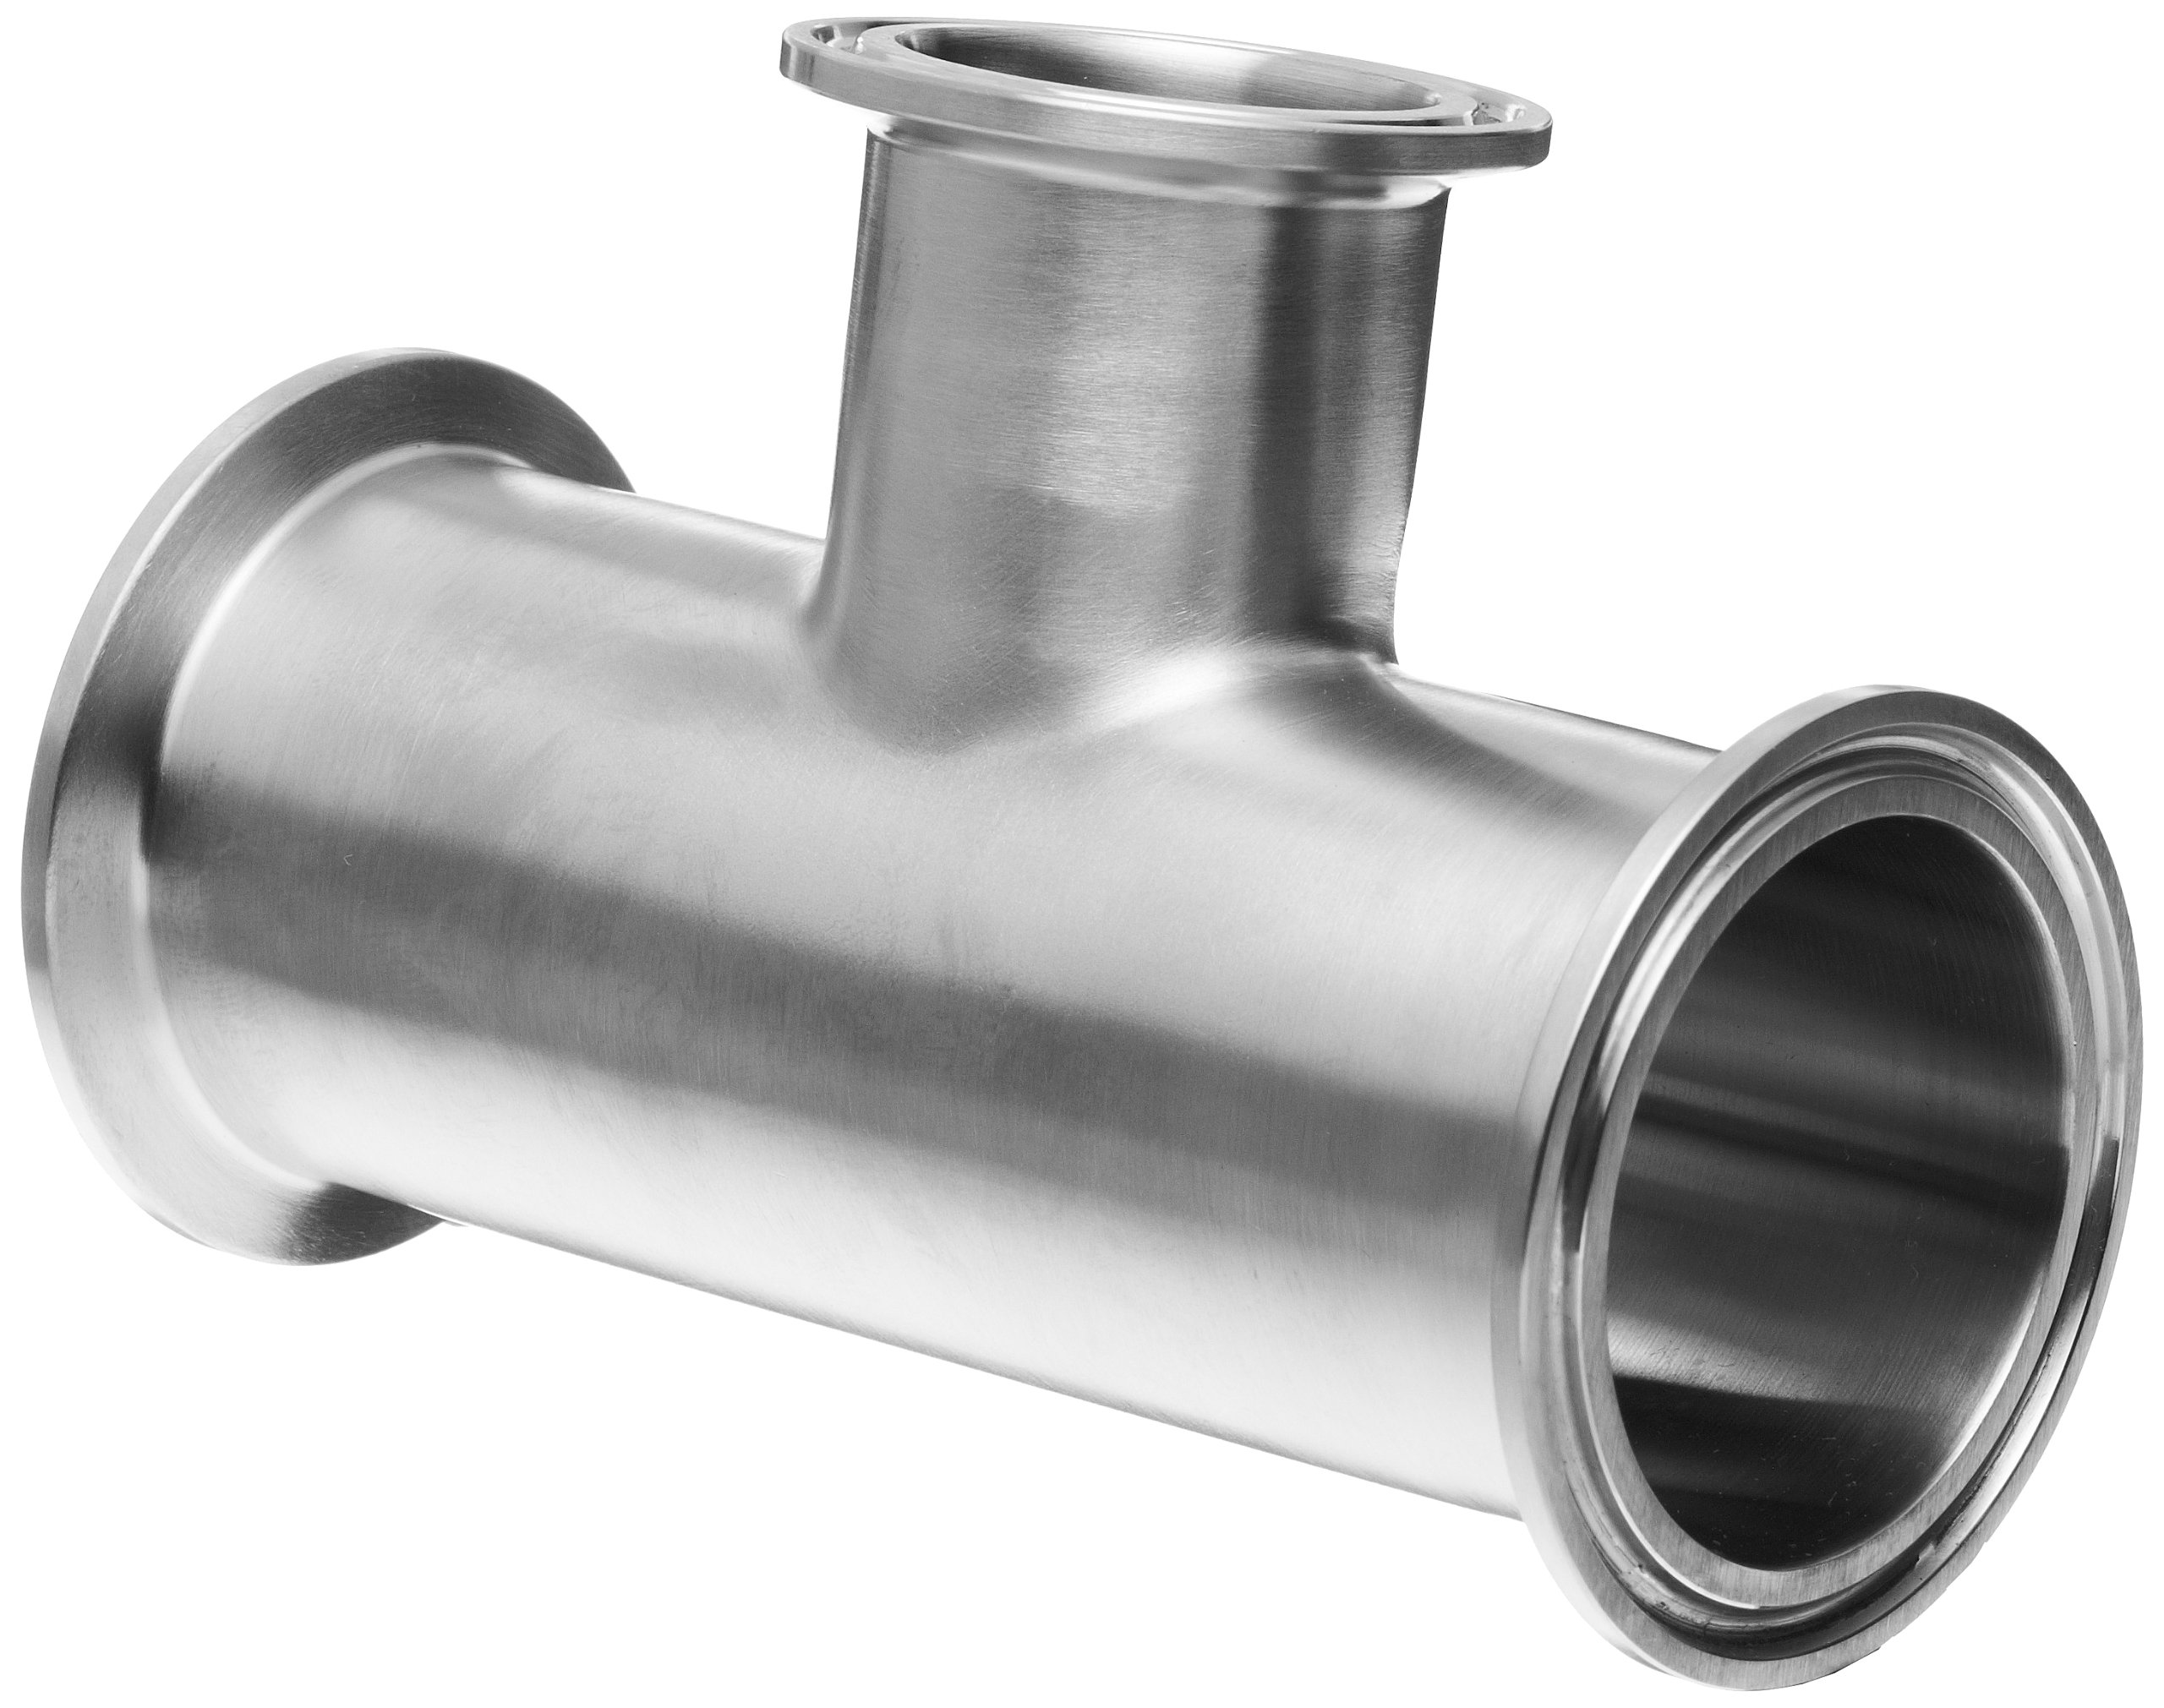 Dixon B7RMP-G200150 Stainless Steel 304 Sanitary Fitting, Reducing Clamp Tee, 2'' Tube OD x 2'' Tube OD x 1-1/2'' Tube OD